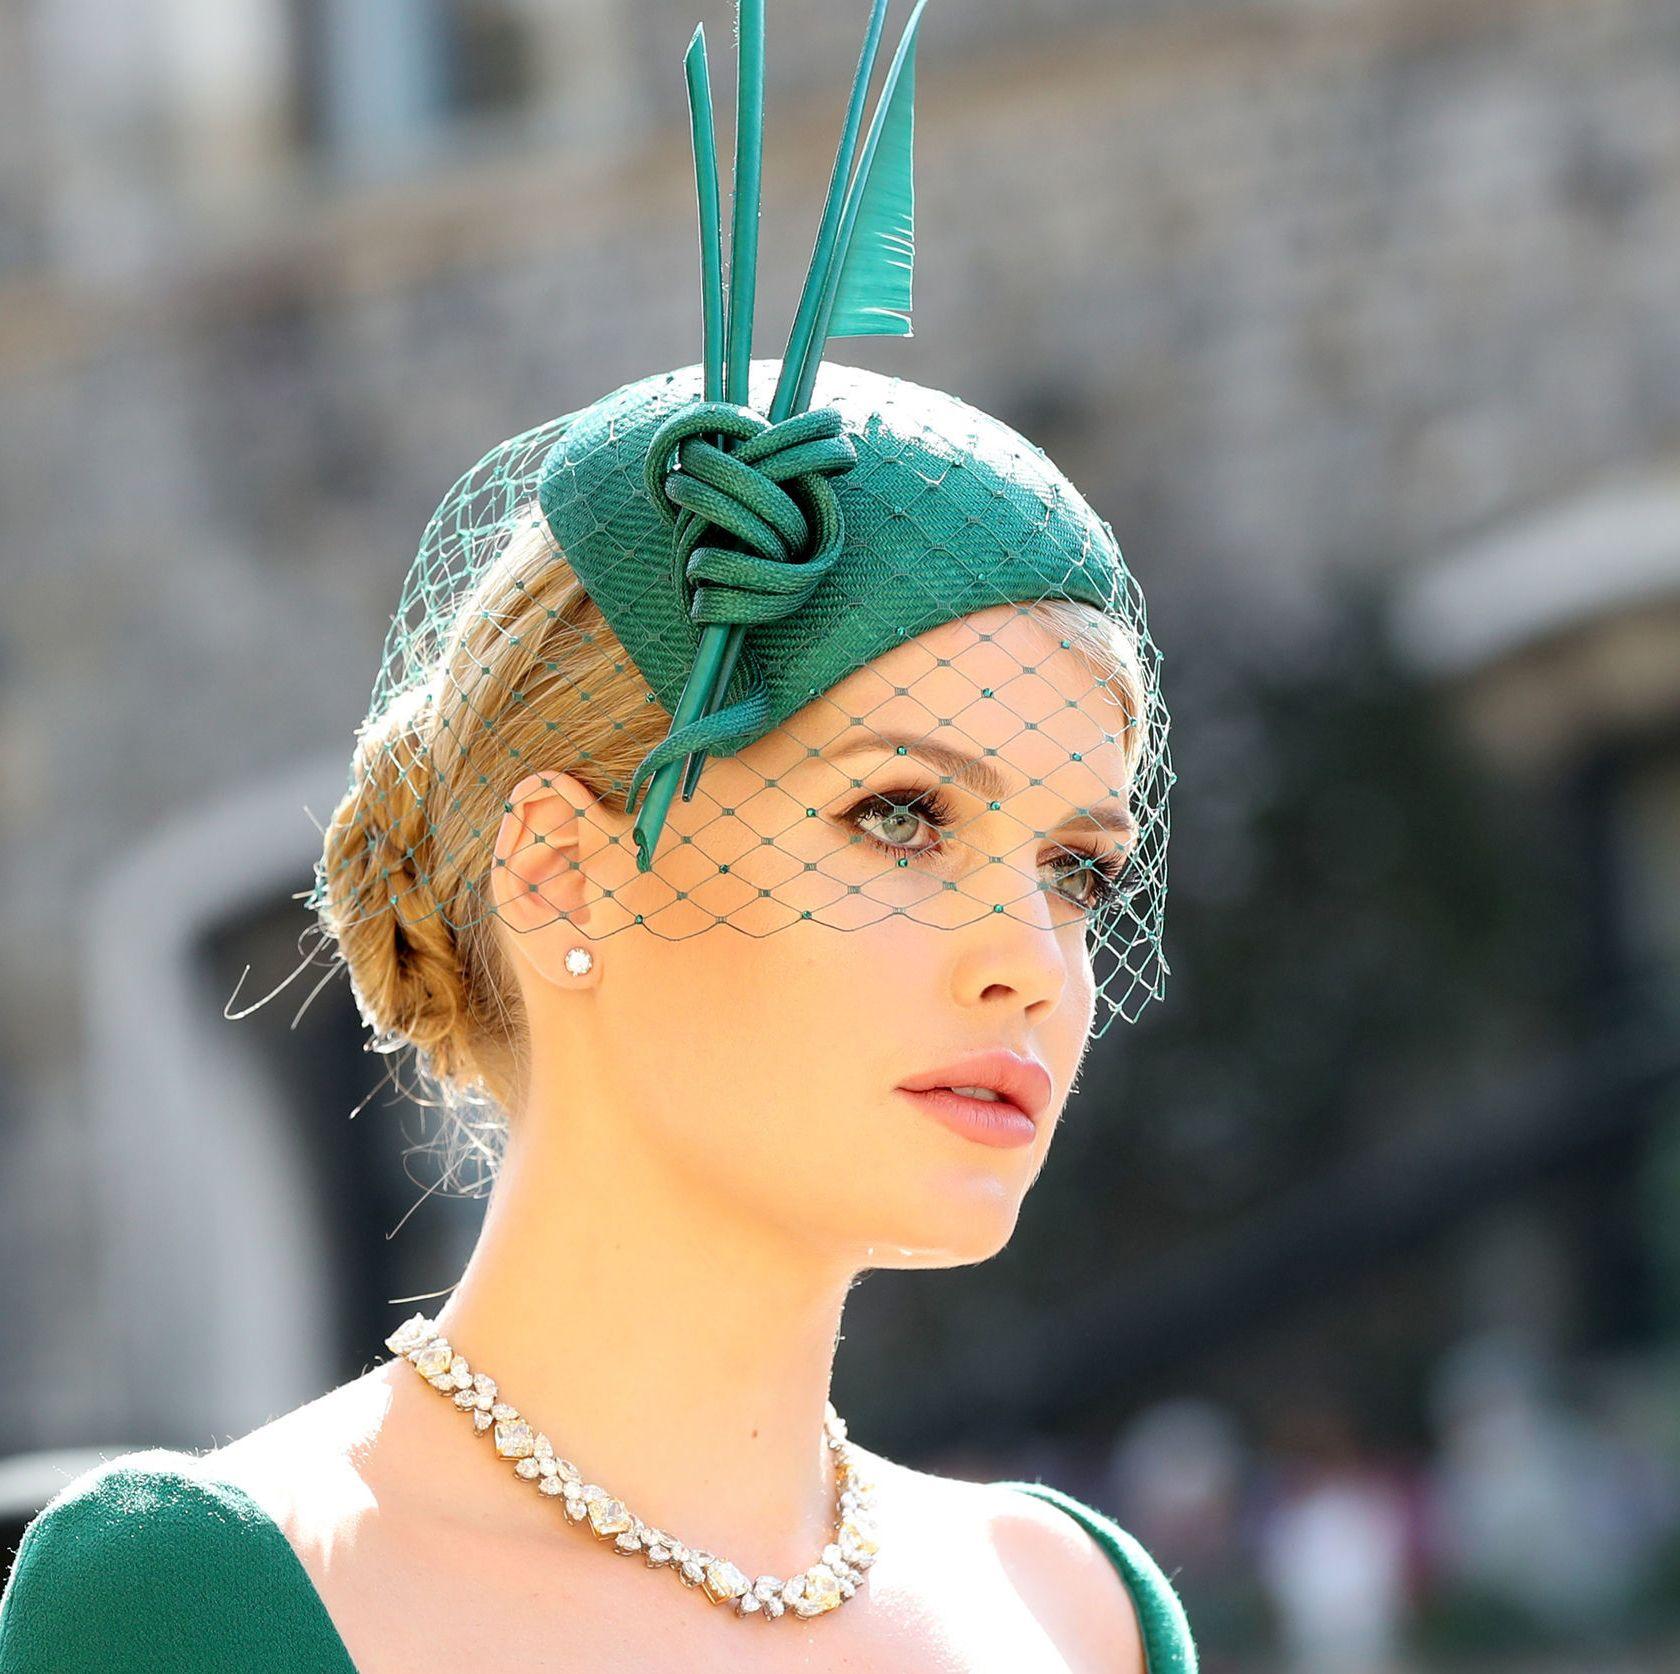 Royal Wedding 2018 Guest Hats,St George's Chapel